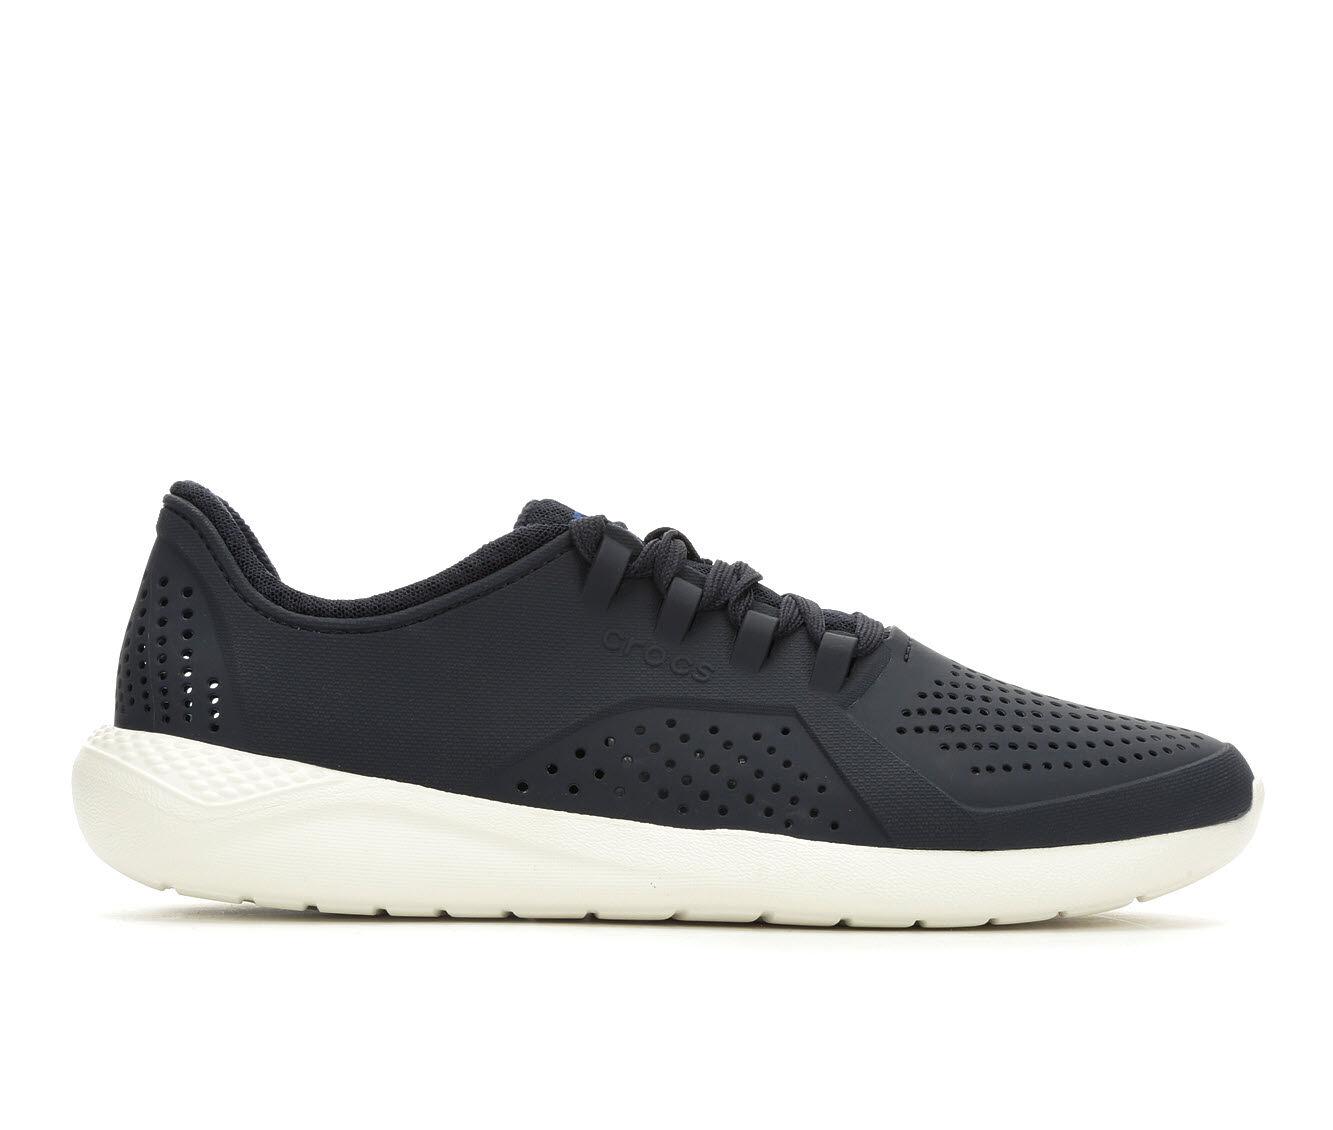 Men's Crocs LiteRide Pacer | Shoe Carnival